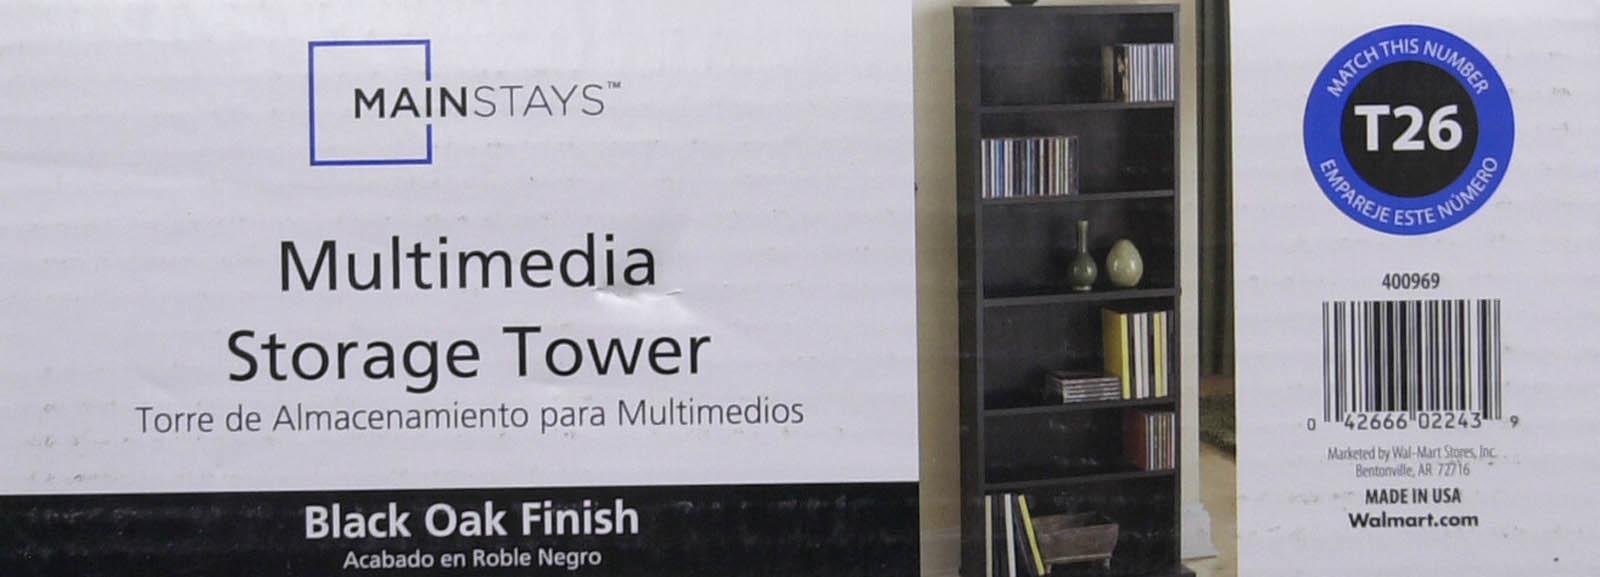 Walmart media storage media storage tower walmart instructions.